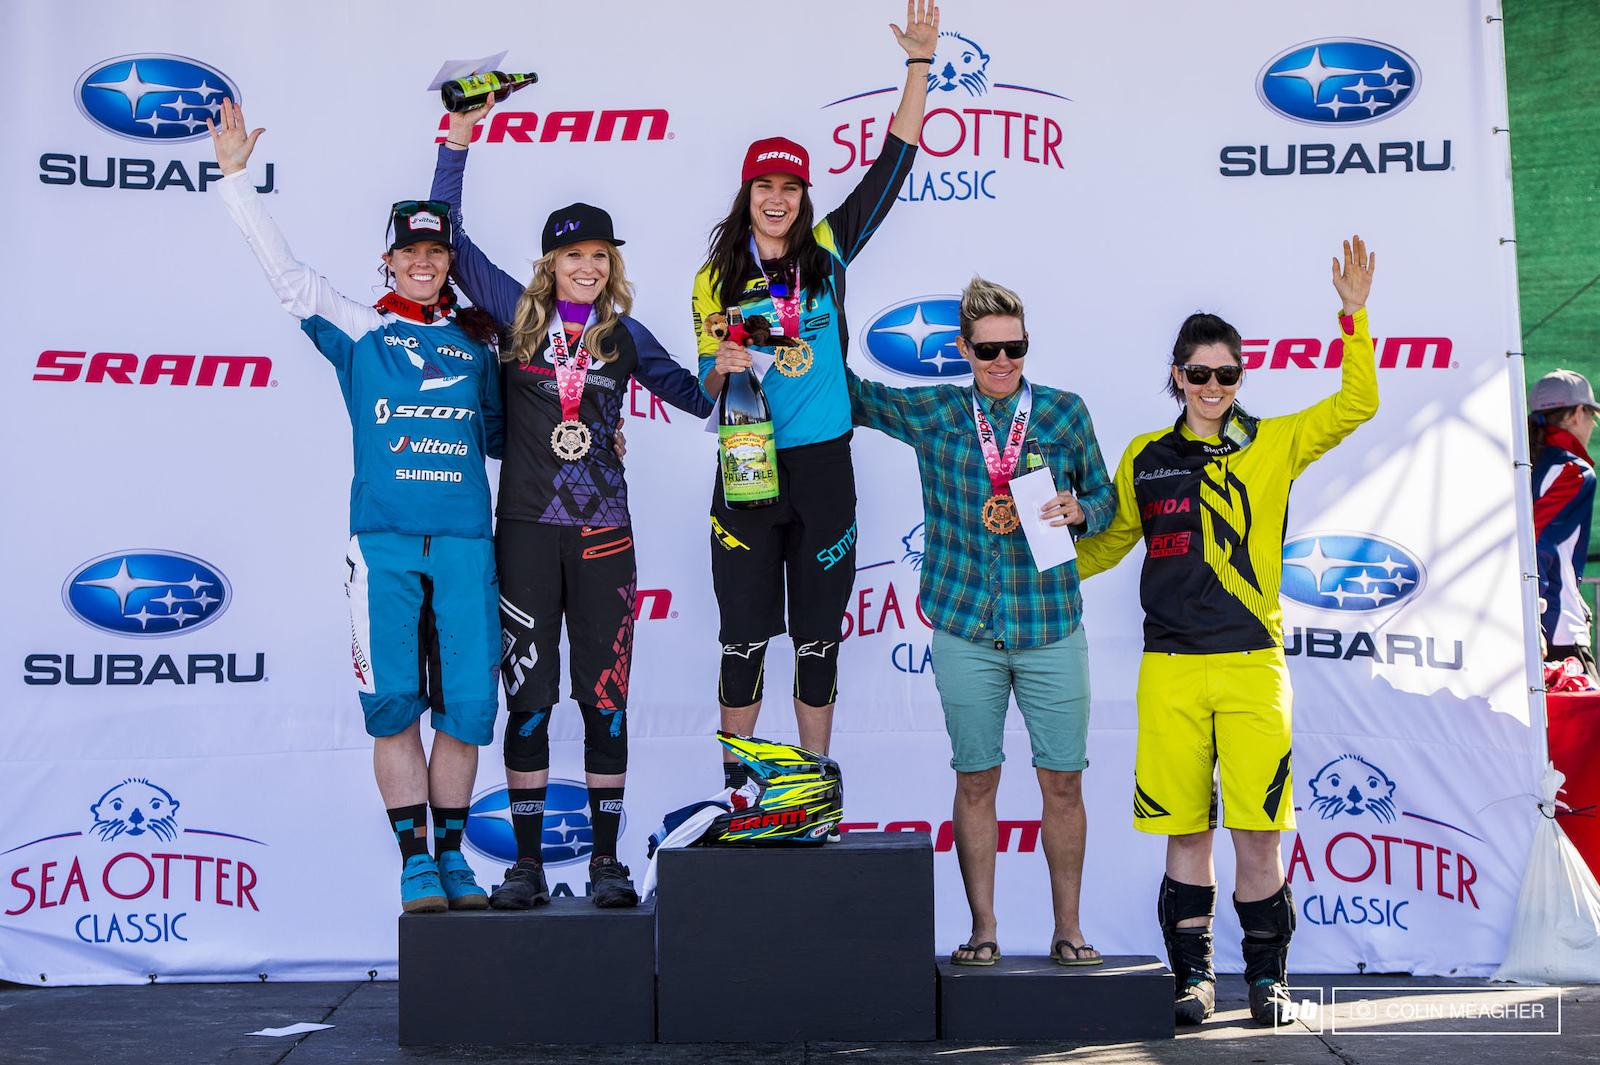 Pro Women s Enduro podium L-R Teal Stetson-Lee 4 Rae Morrison 2 Anneke Beerten 1 Joanna Peterson 3 and Porsha Murdock 5 .